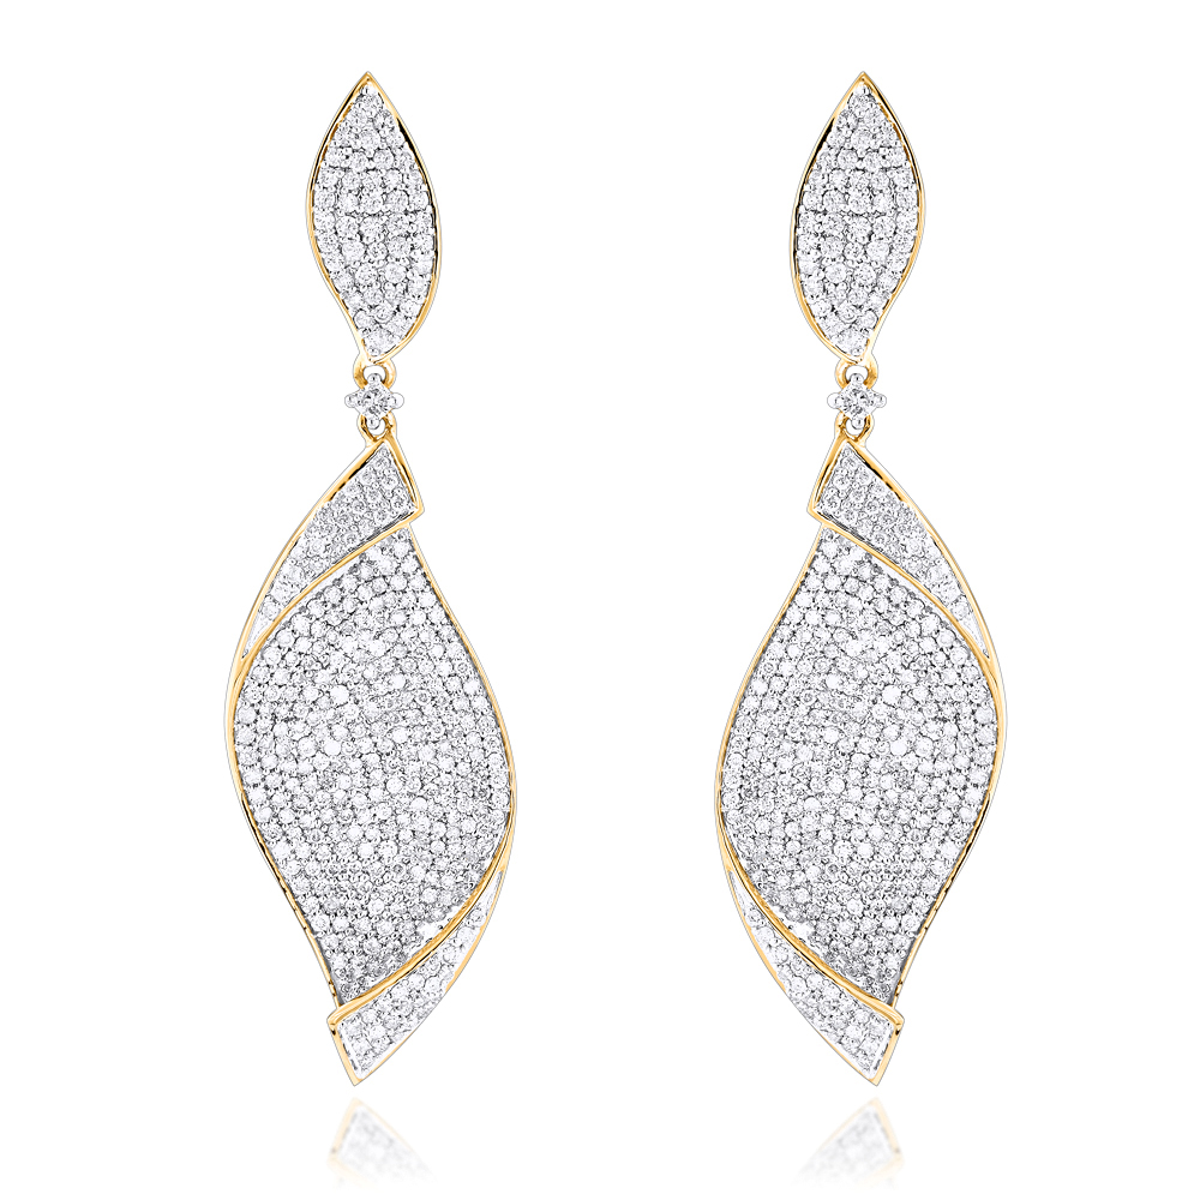 18K Gold Ladies Designer Diamond Leaf Earrings 3 carats